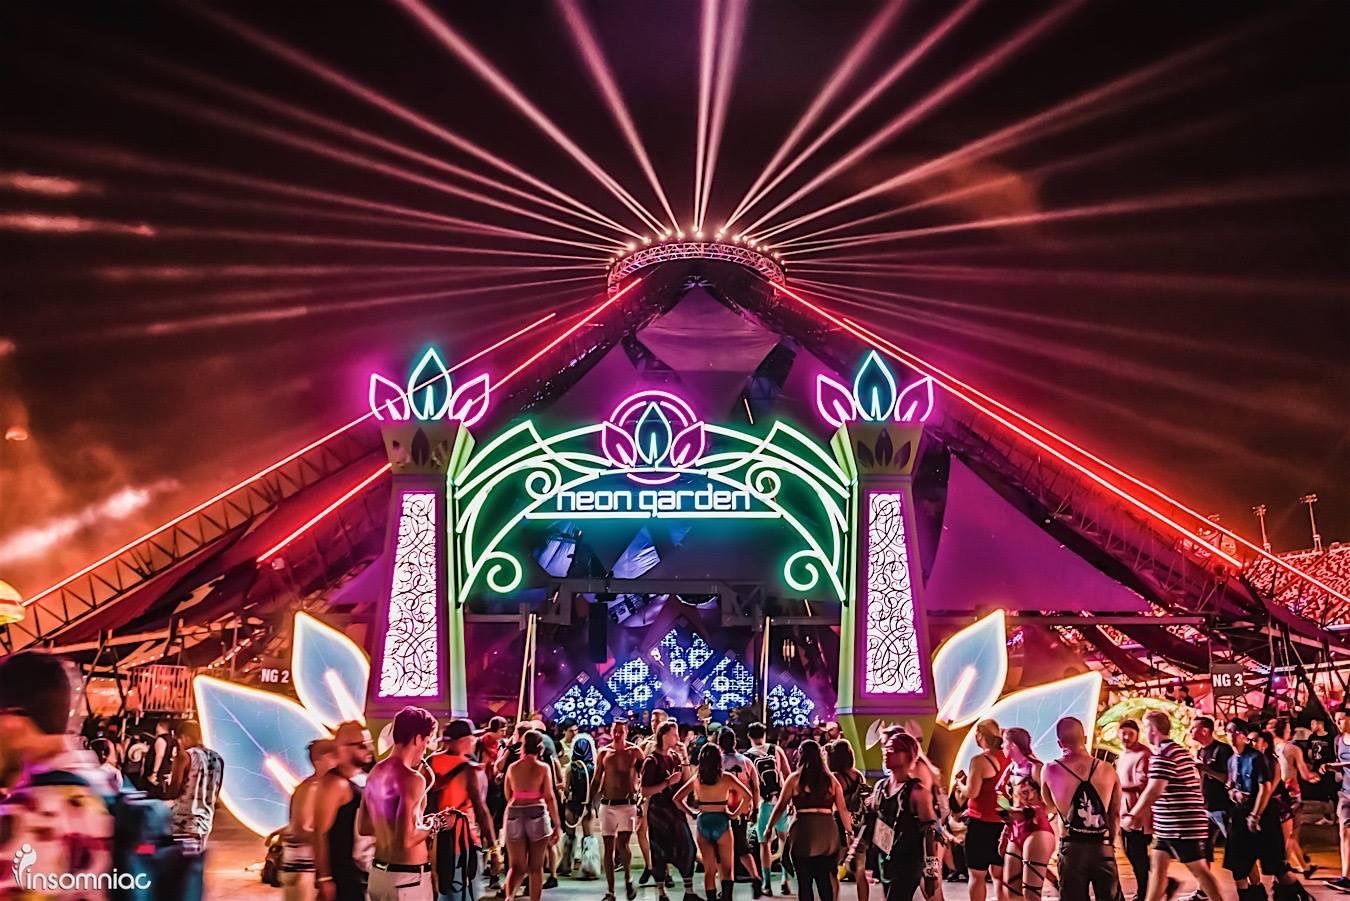 Factory To Host NeonGARDEN Stage At EDC Las Vegas - Edc las vegas map 2016